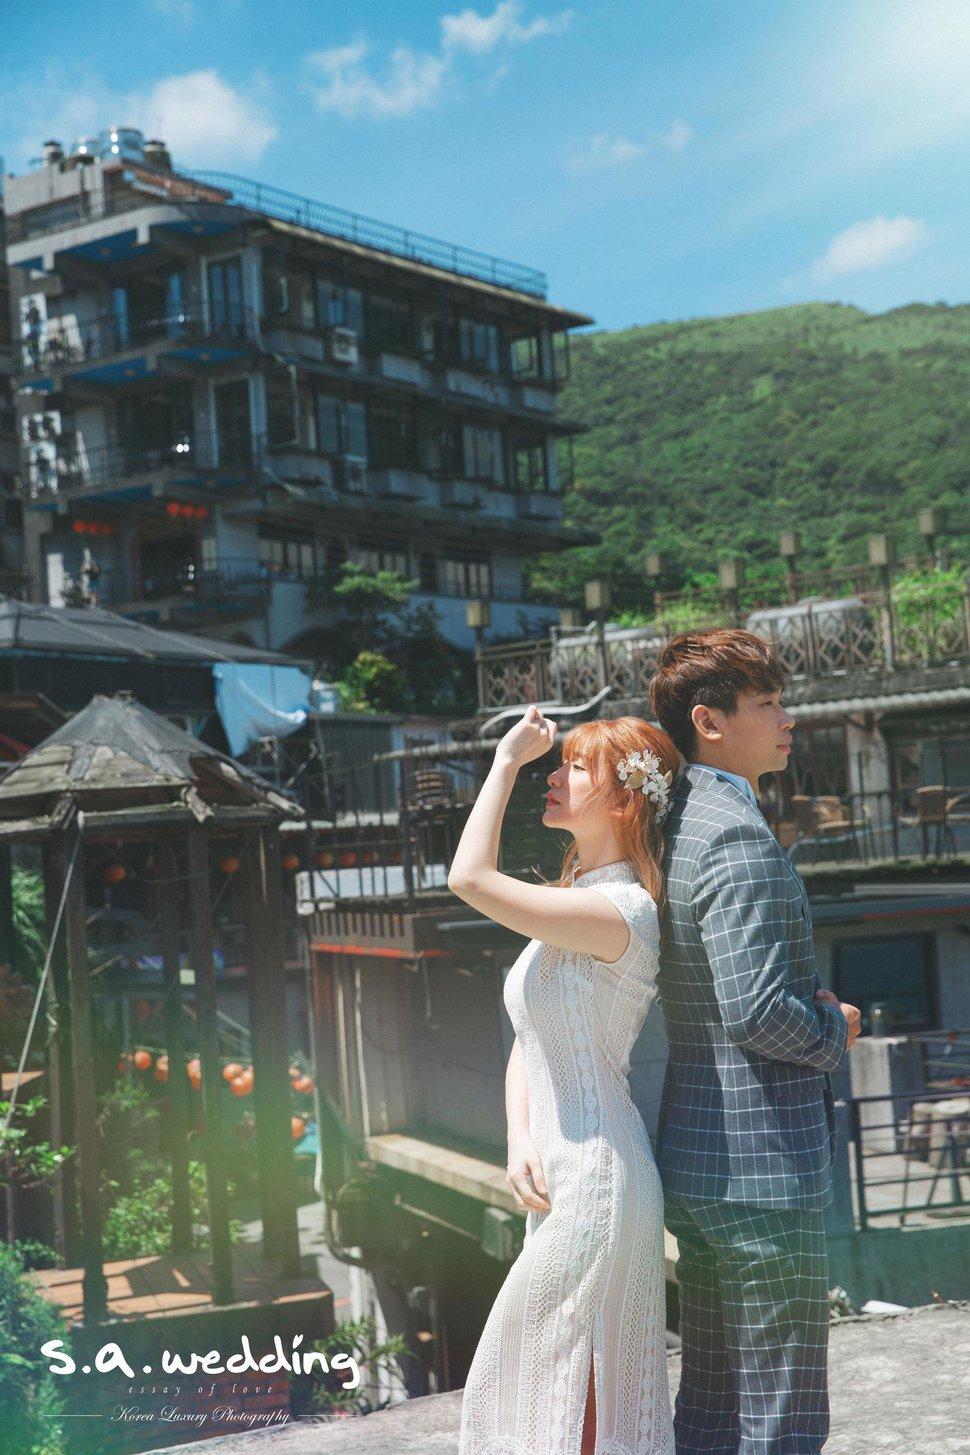 NSH_0578_ps (Copy) - s.a. wedding 韓國婚紗攝影《結婚吧》